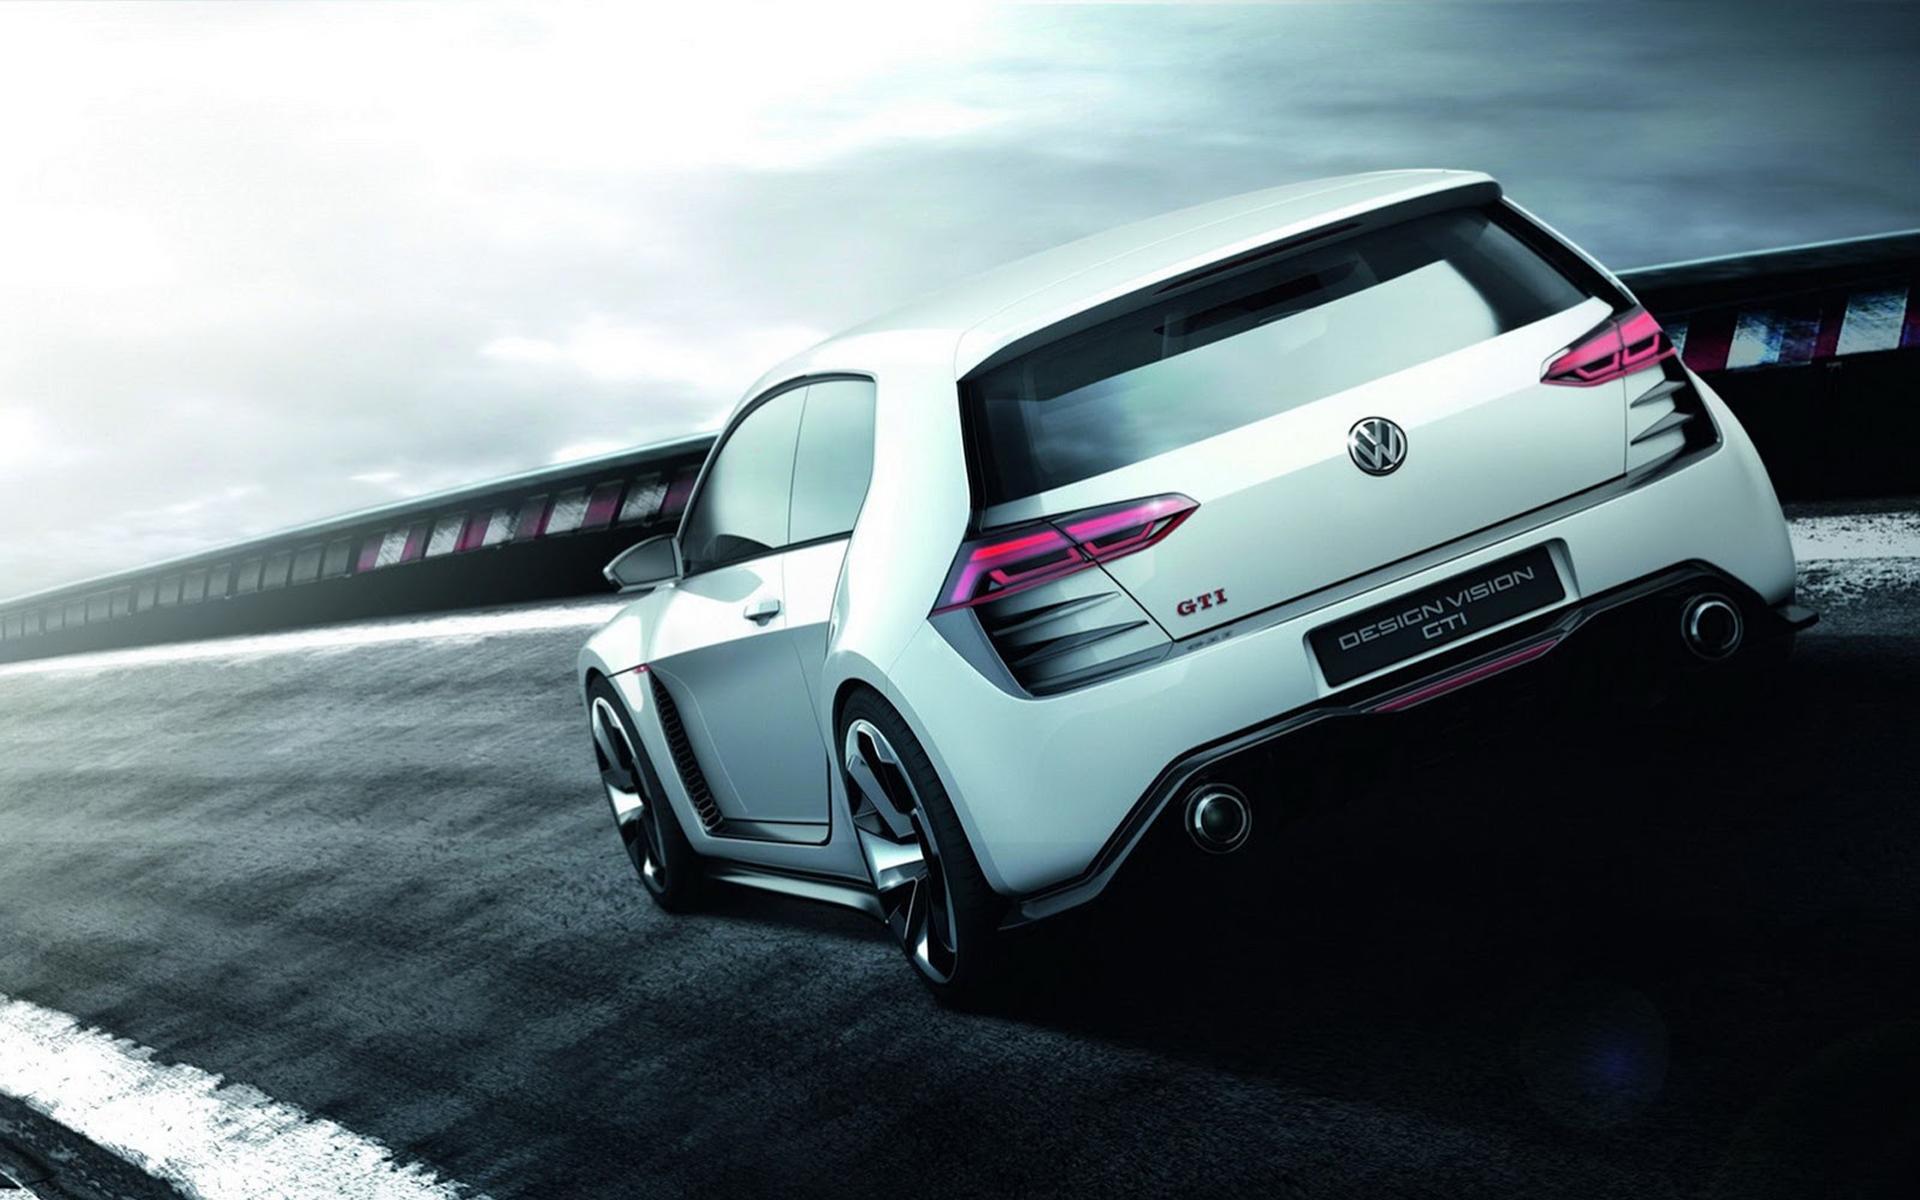 Golf GTI Design Vision